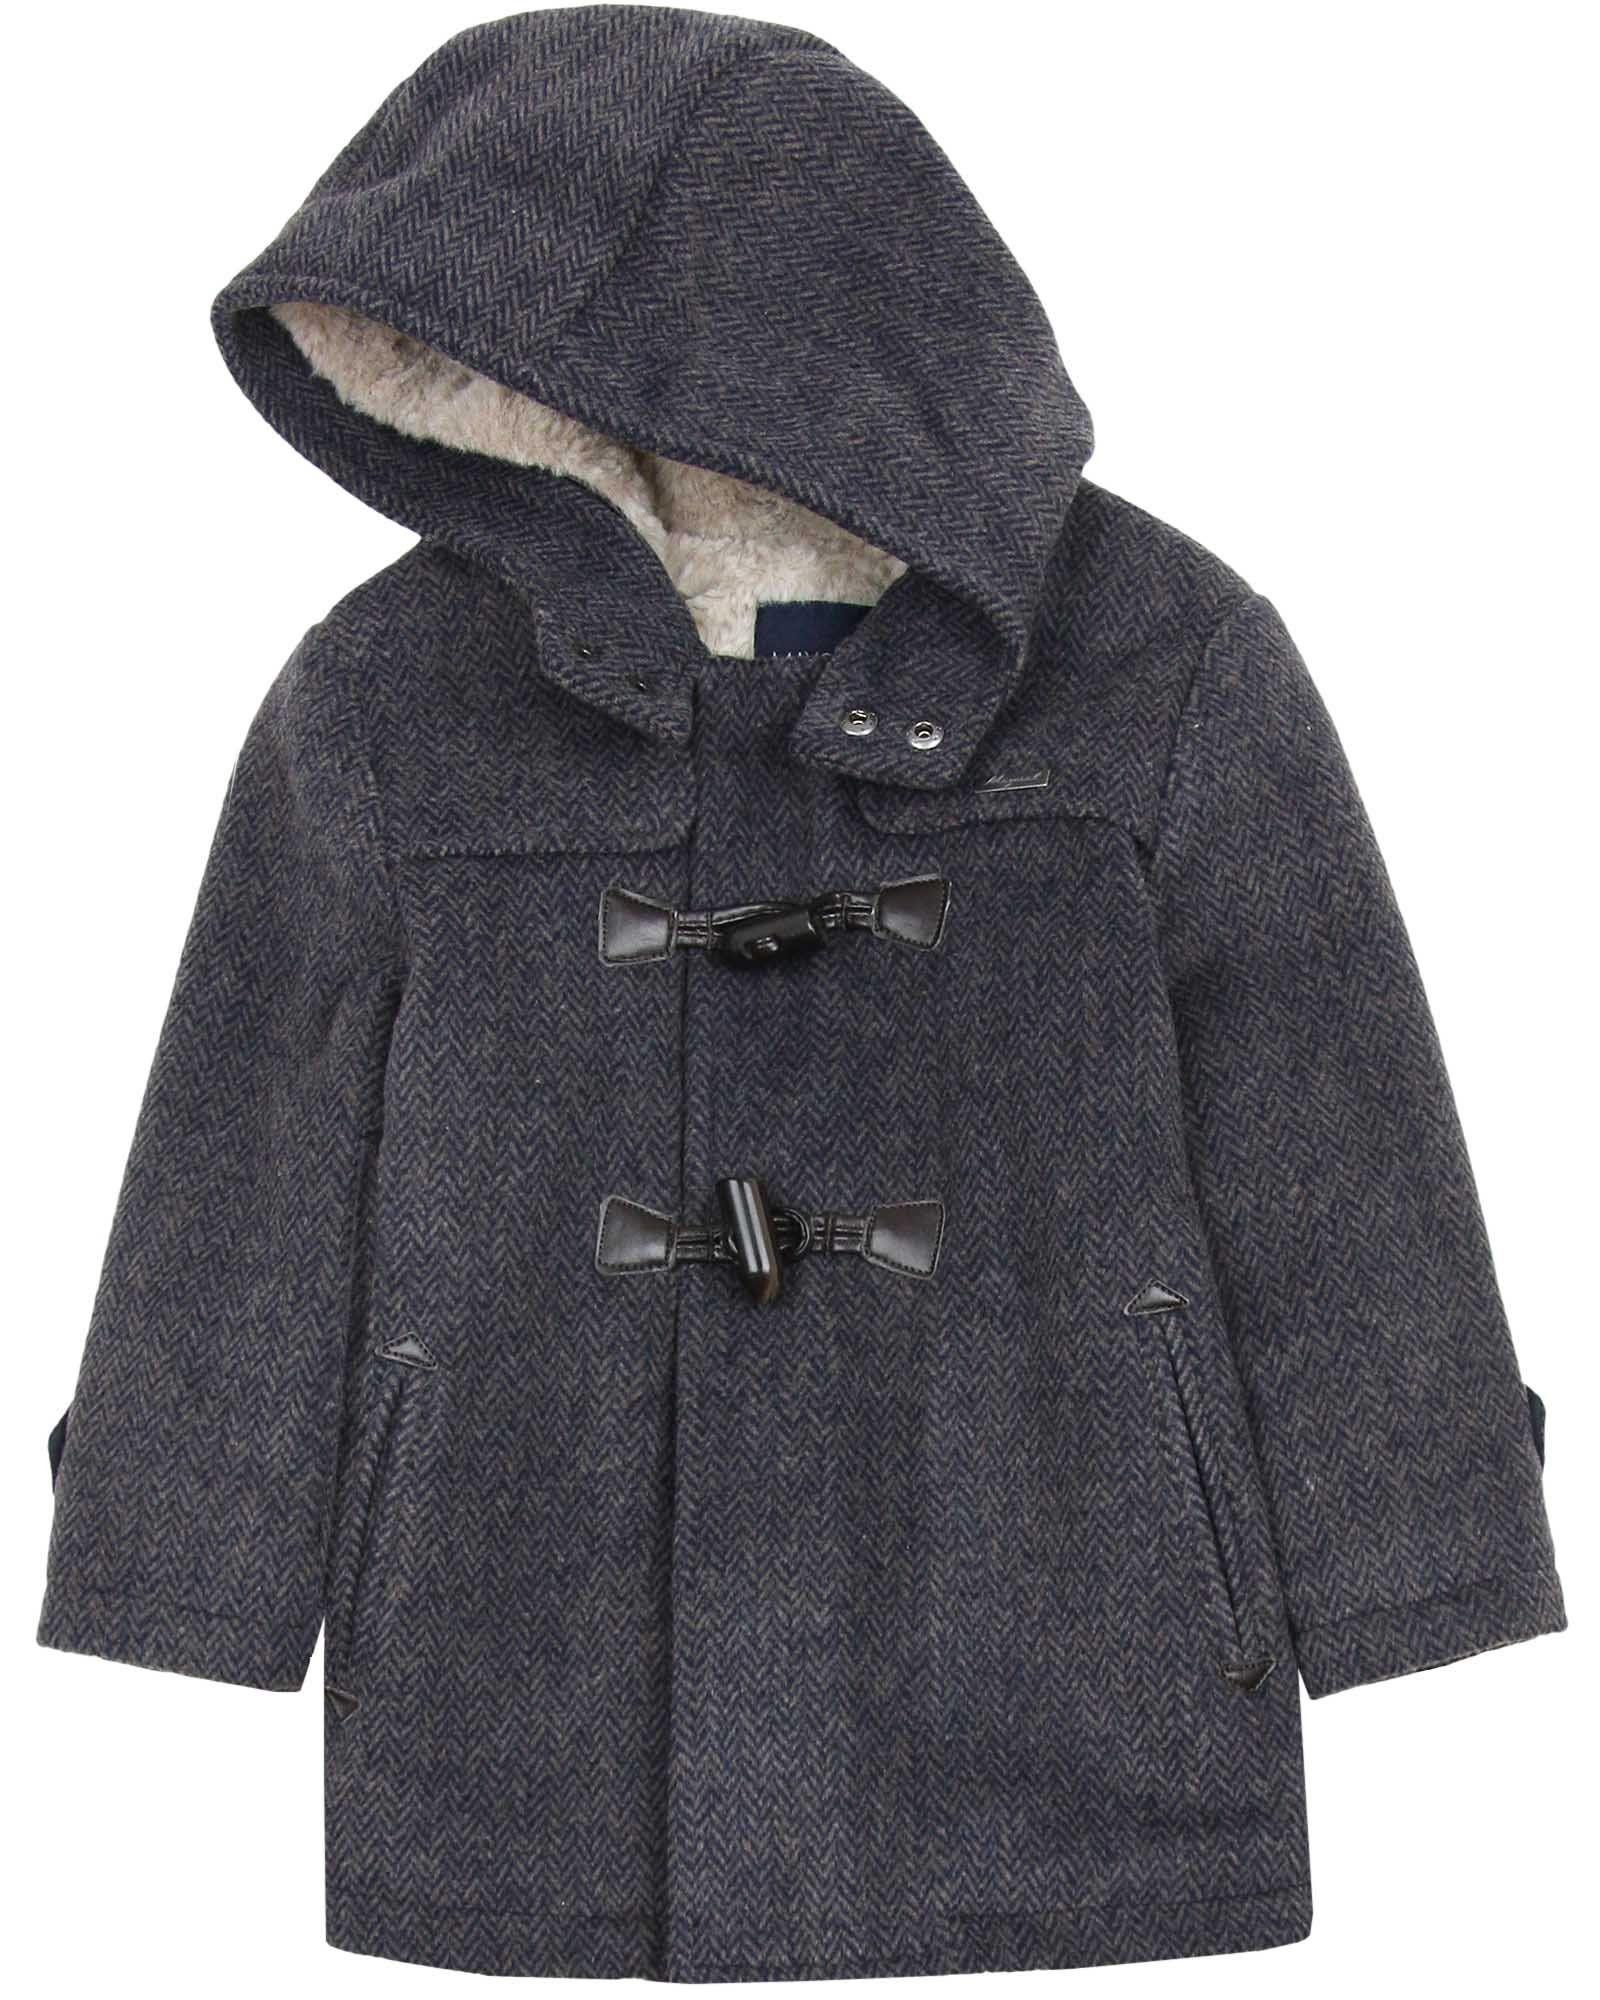 a1c1121502a7 Mayoral Boy s Gray Duffle Coat